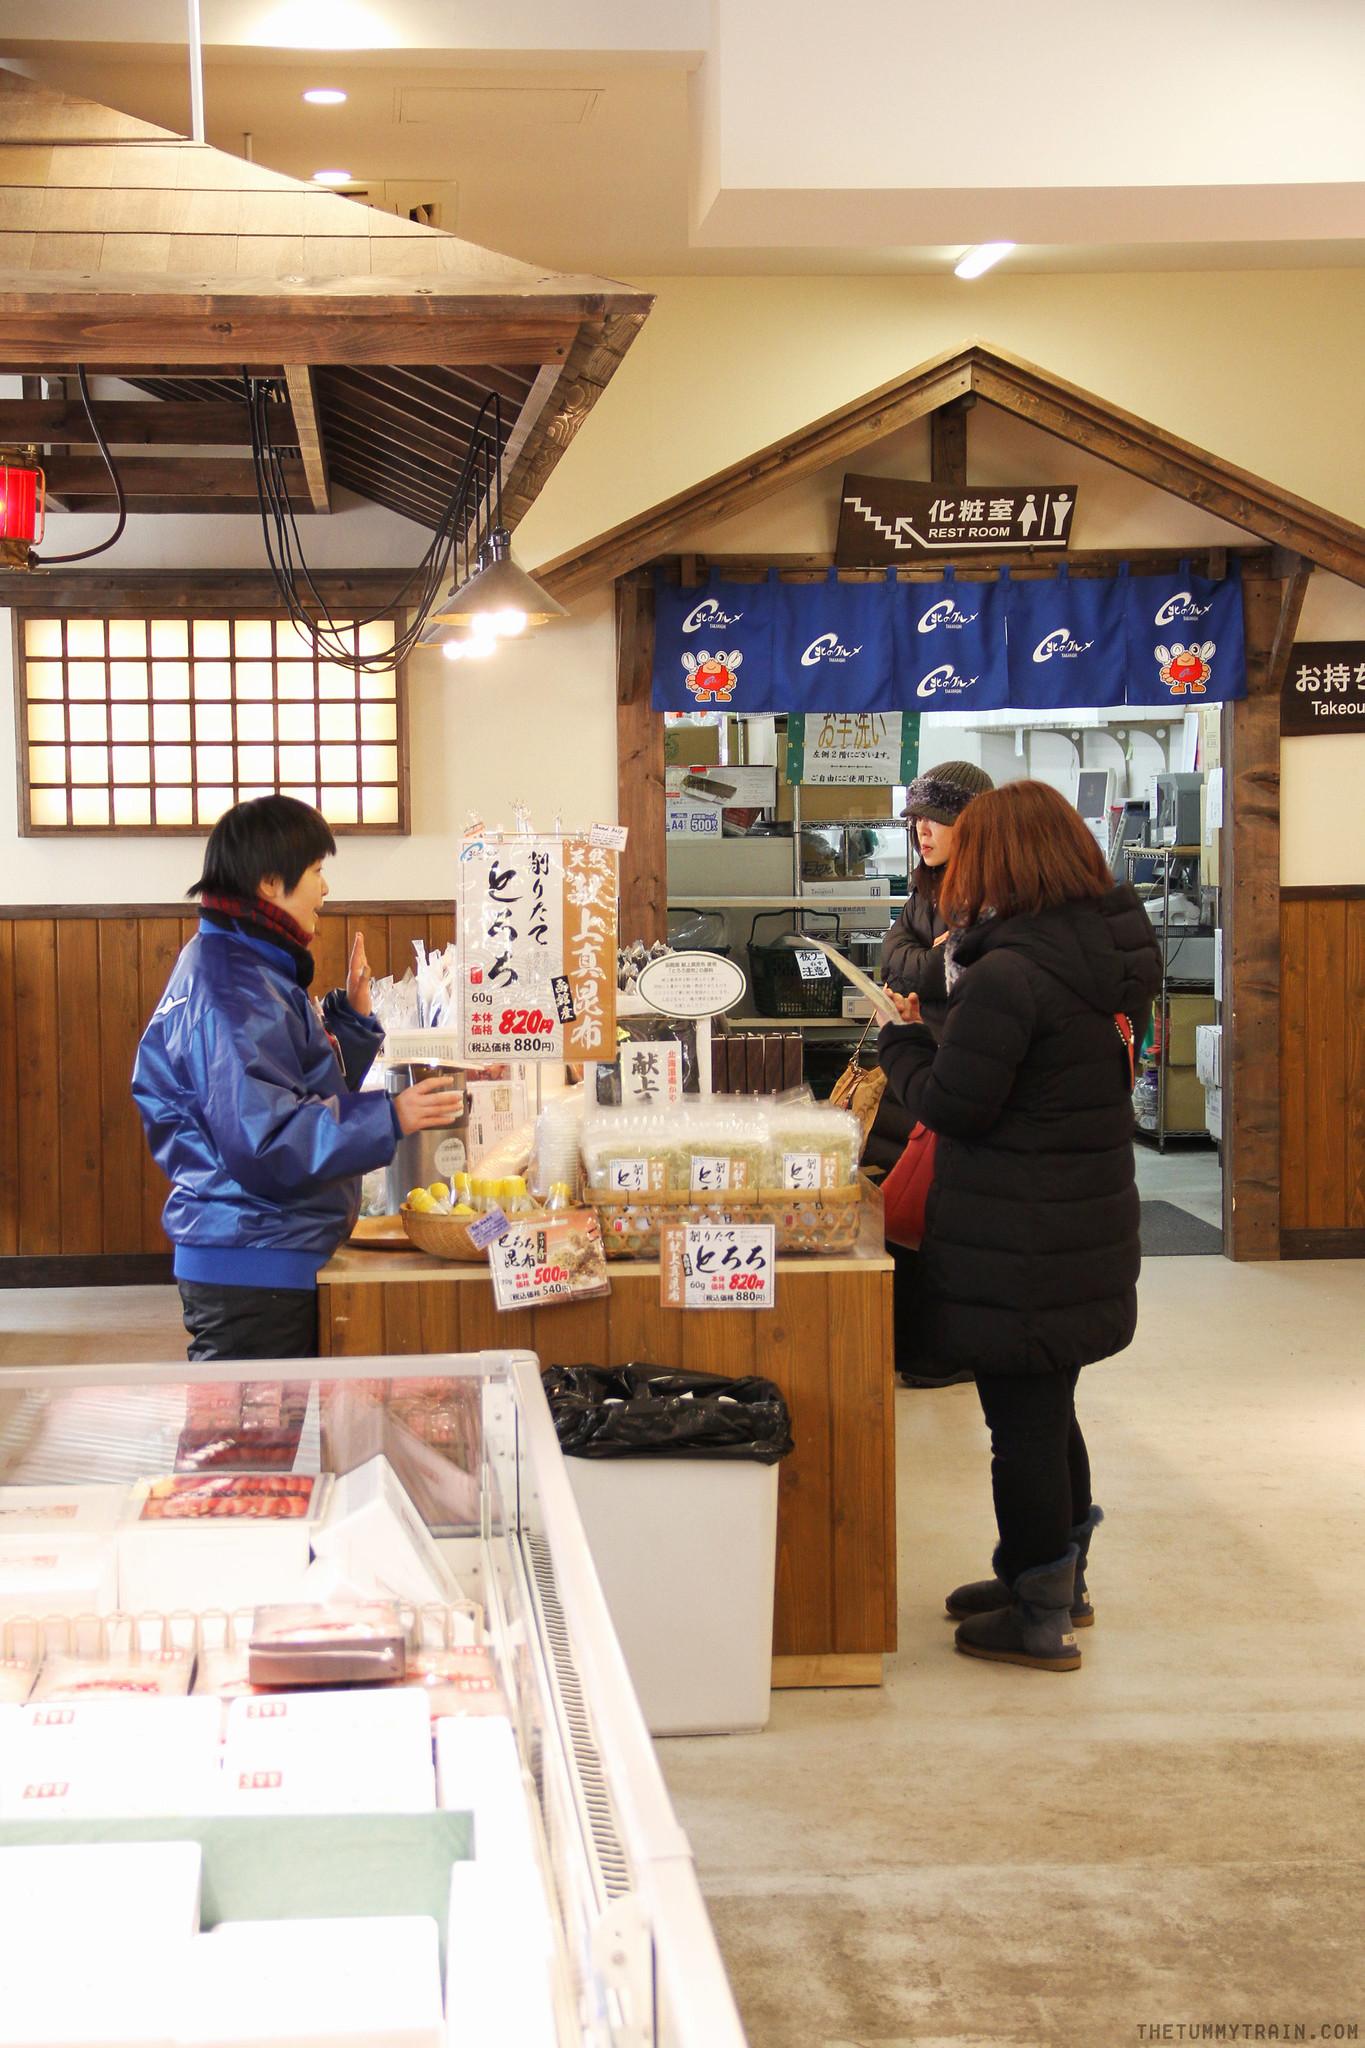 32816724062 abdf2238d1 k - Sapporo Travel Diary 2017: A brief visit to the Sapporo Central Wholesale Market